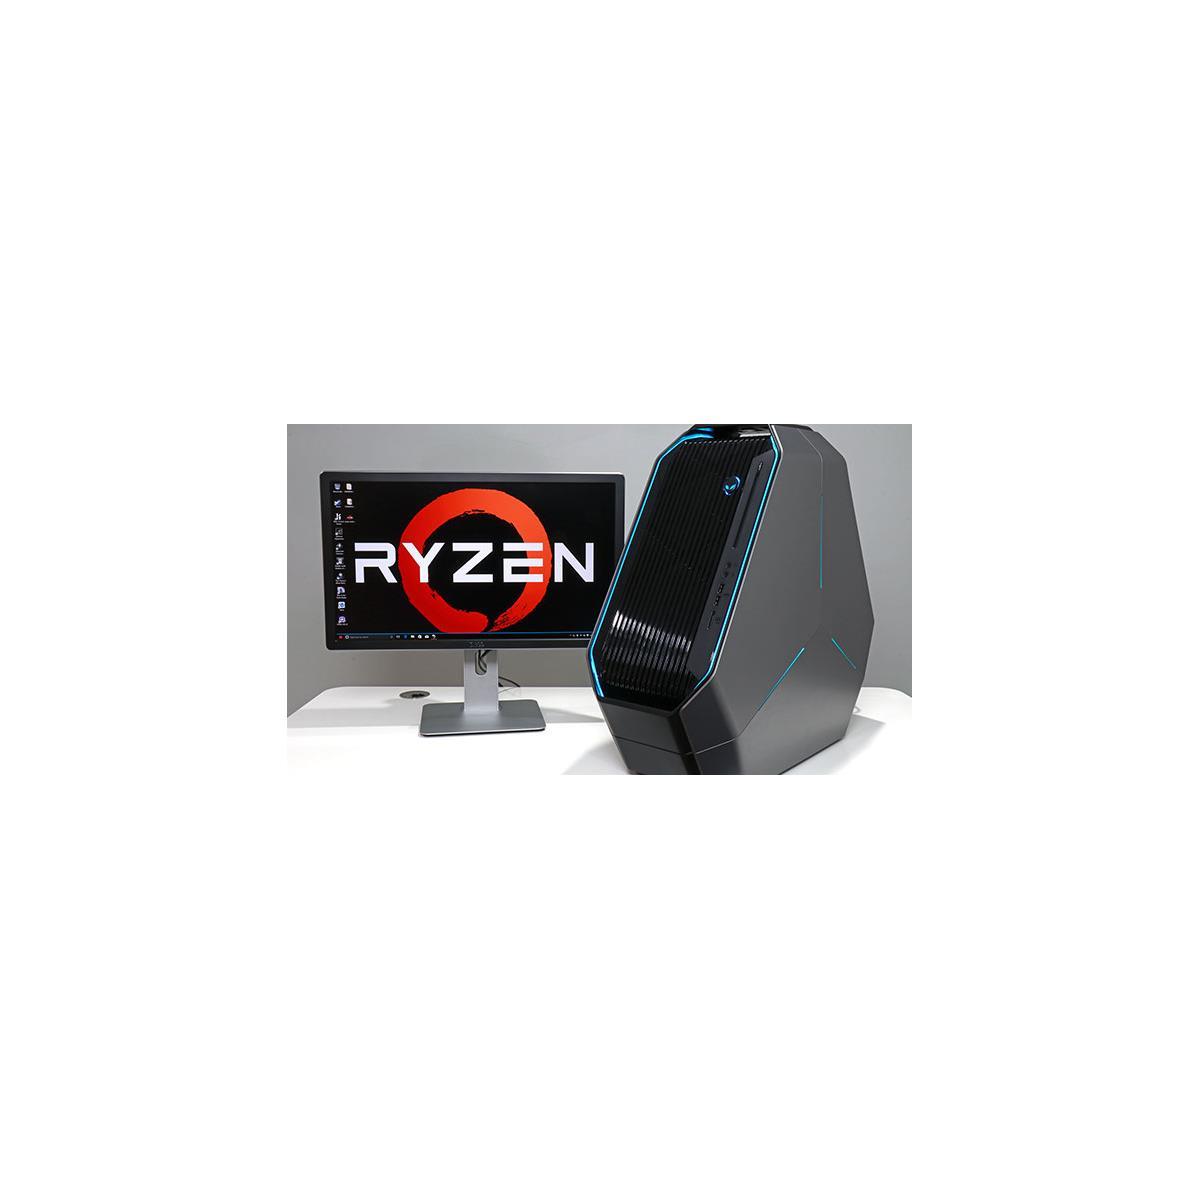 Alienware Area-51 Ryzen Threadripper Edition Hands-On With